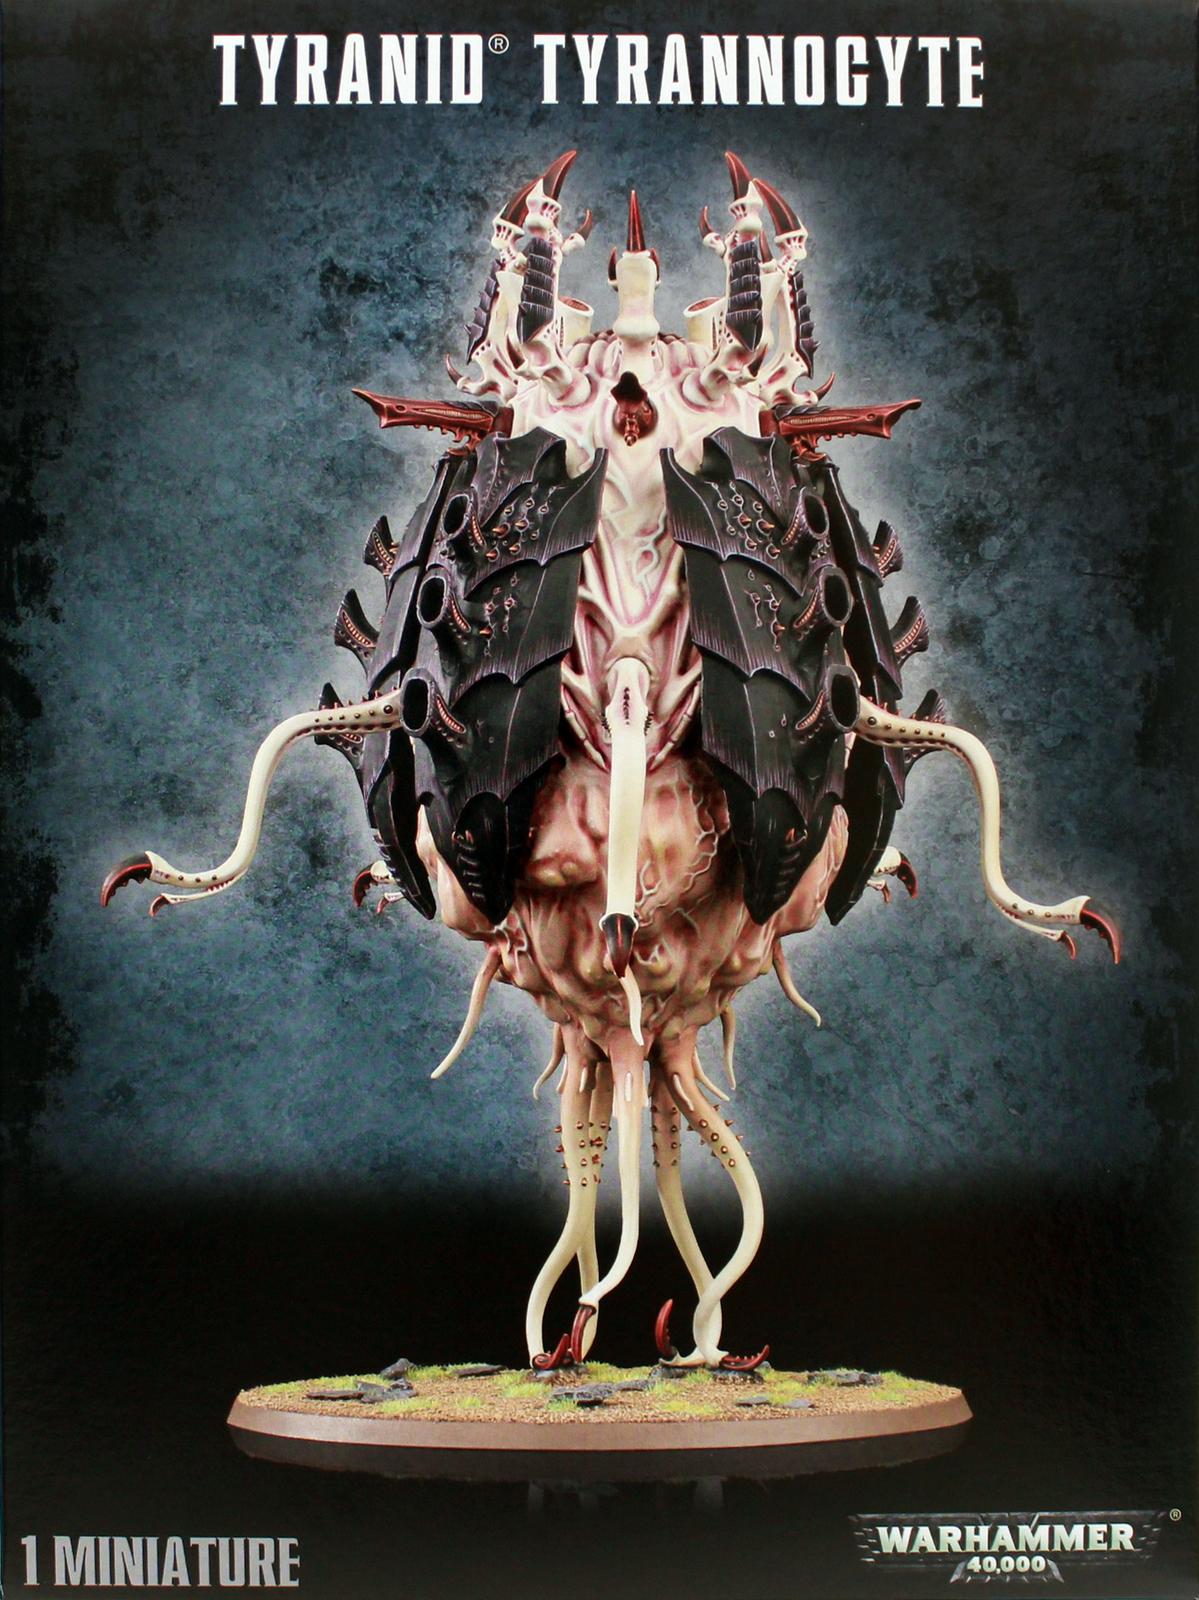 Warhammer 40,000 Tyranid Tyrannocyte image